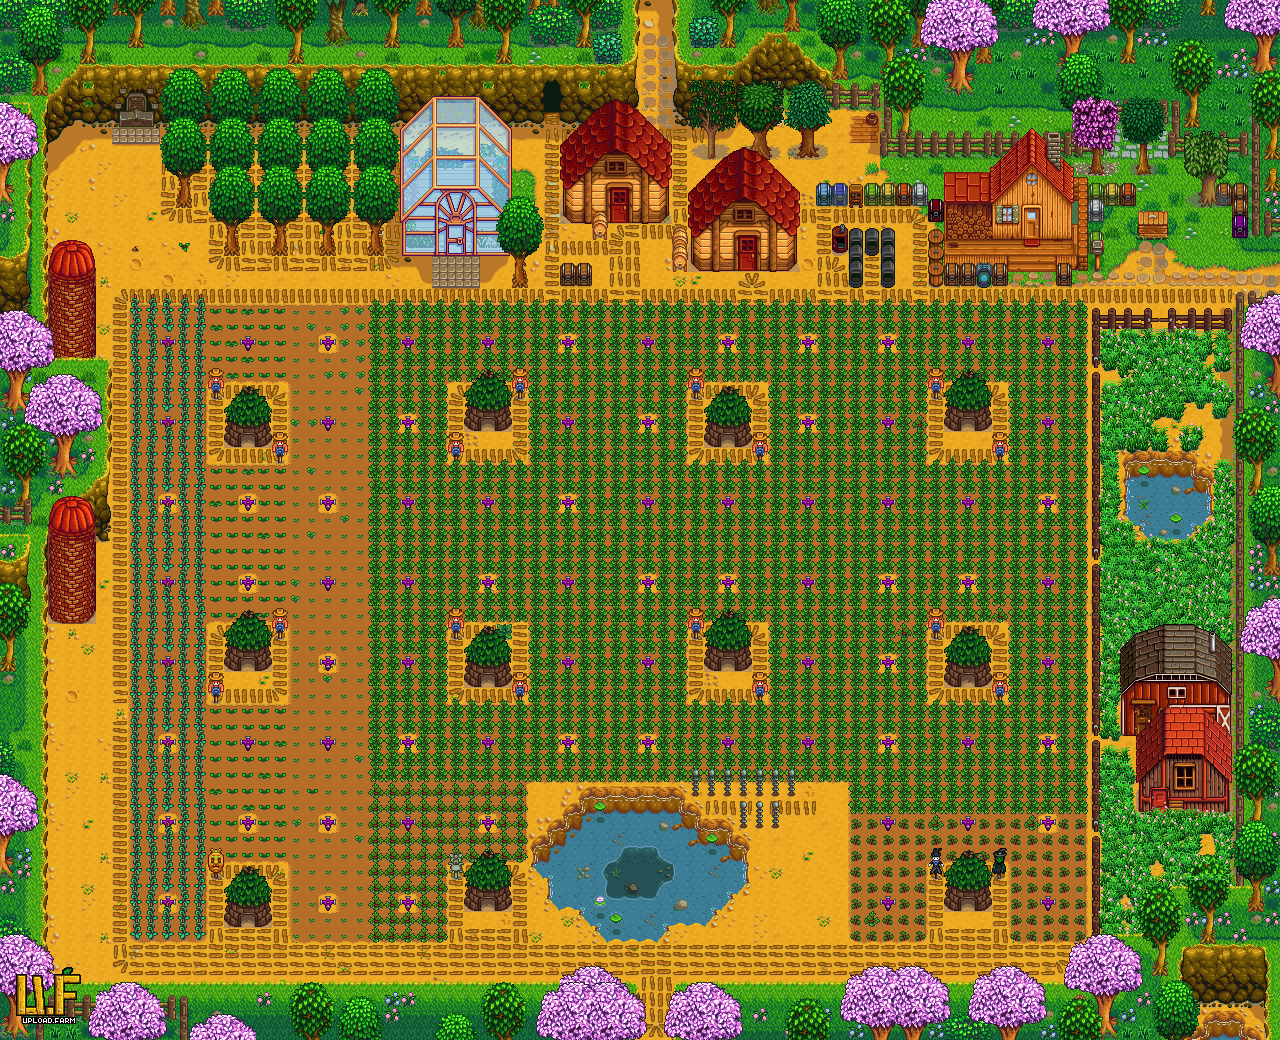 pepper mill farm stardew valley summary generator